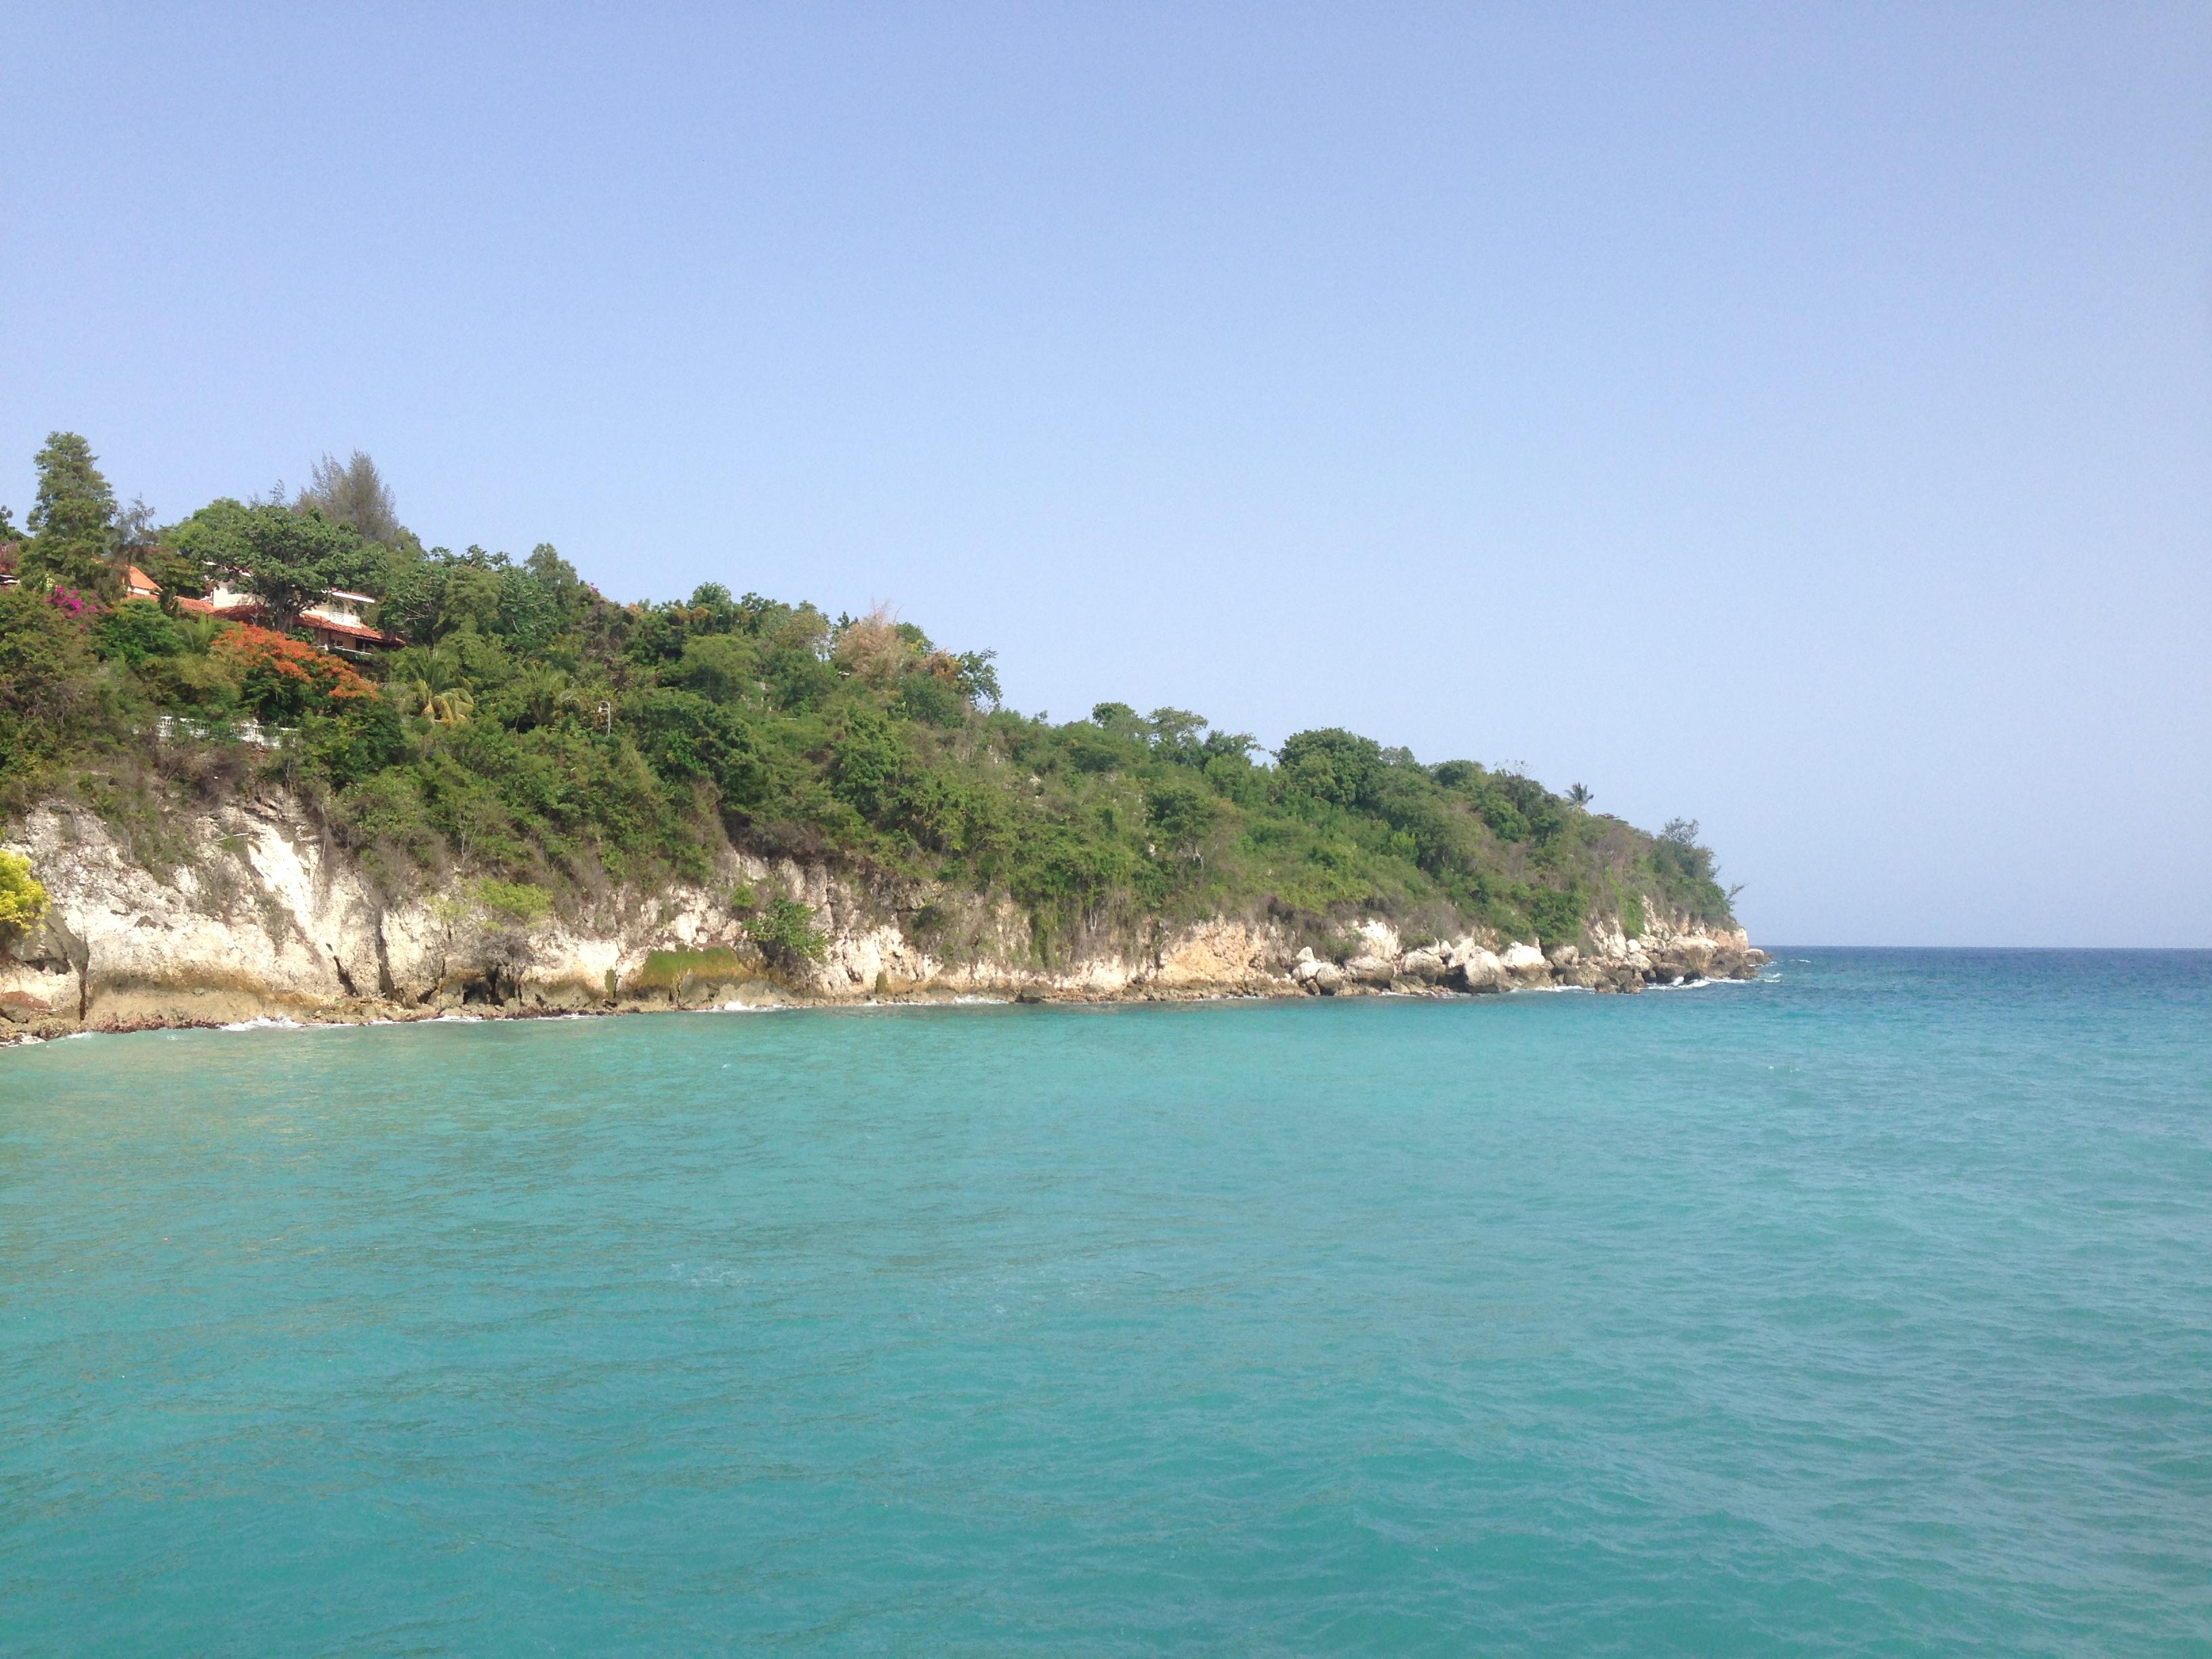 La Saline beach in Jacmel Haiti